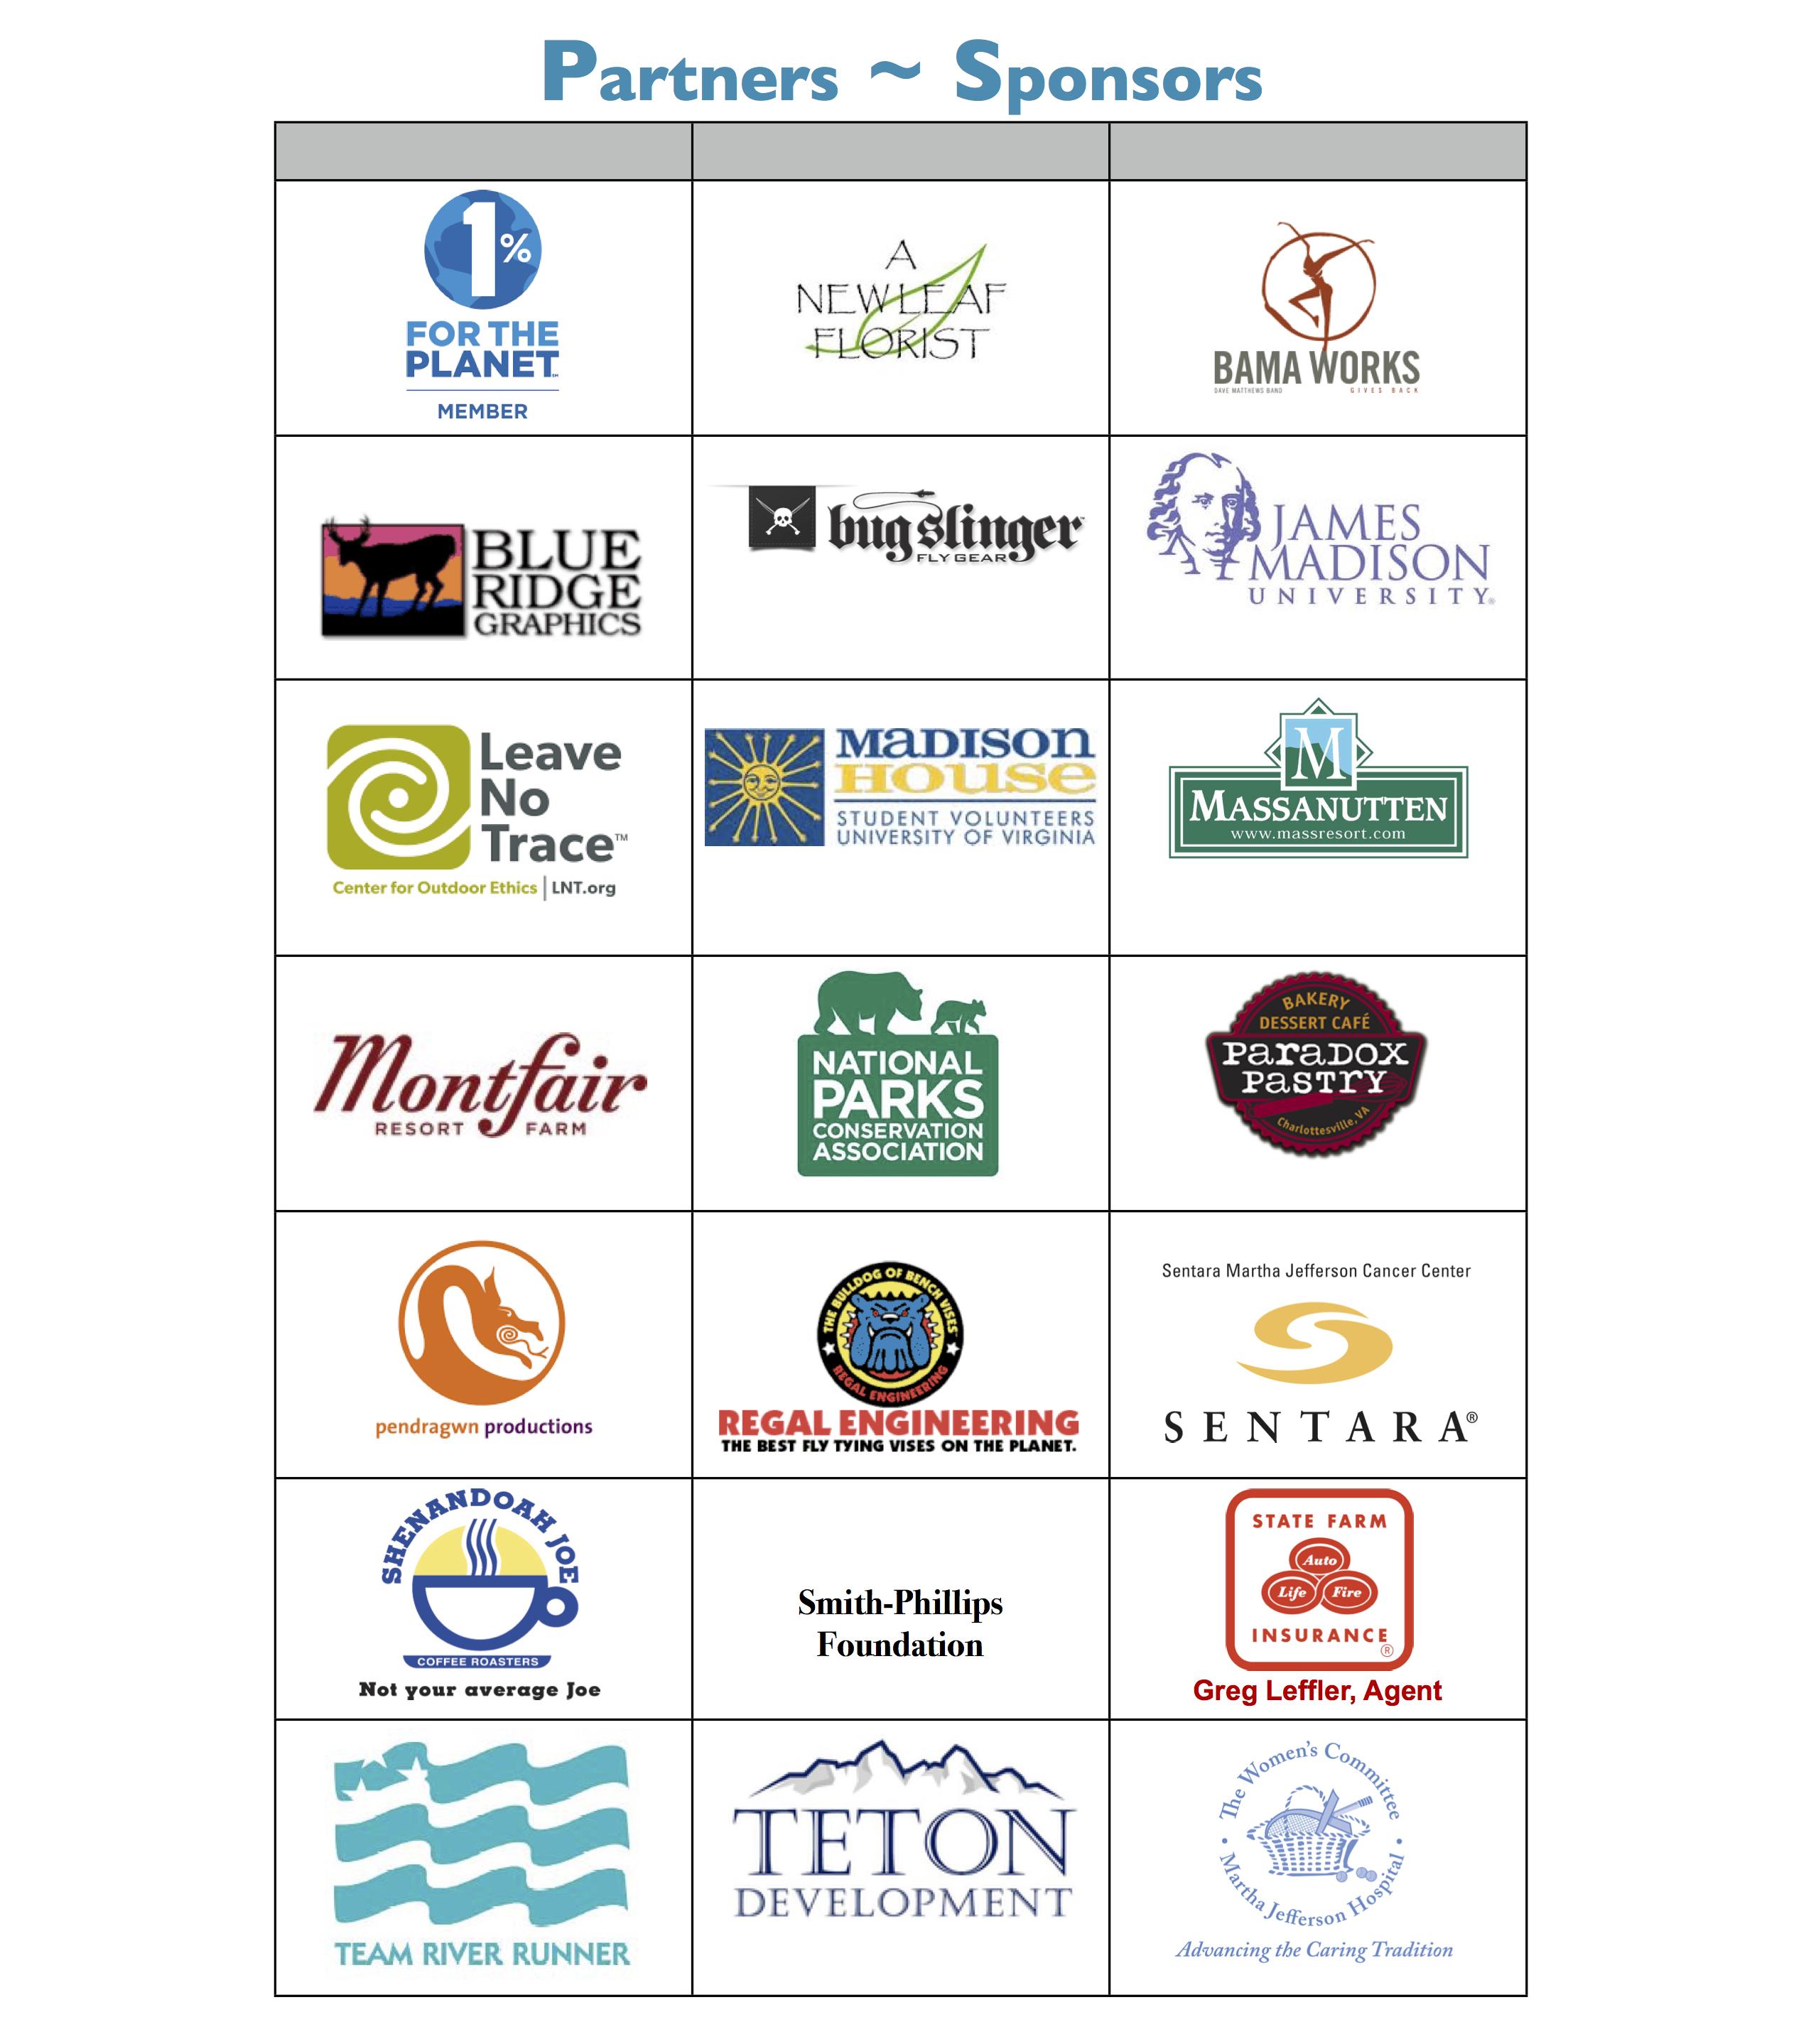 Partners Sponsors Logos 2017_1